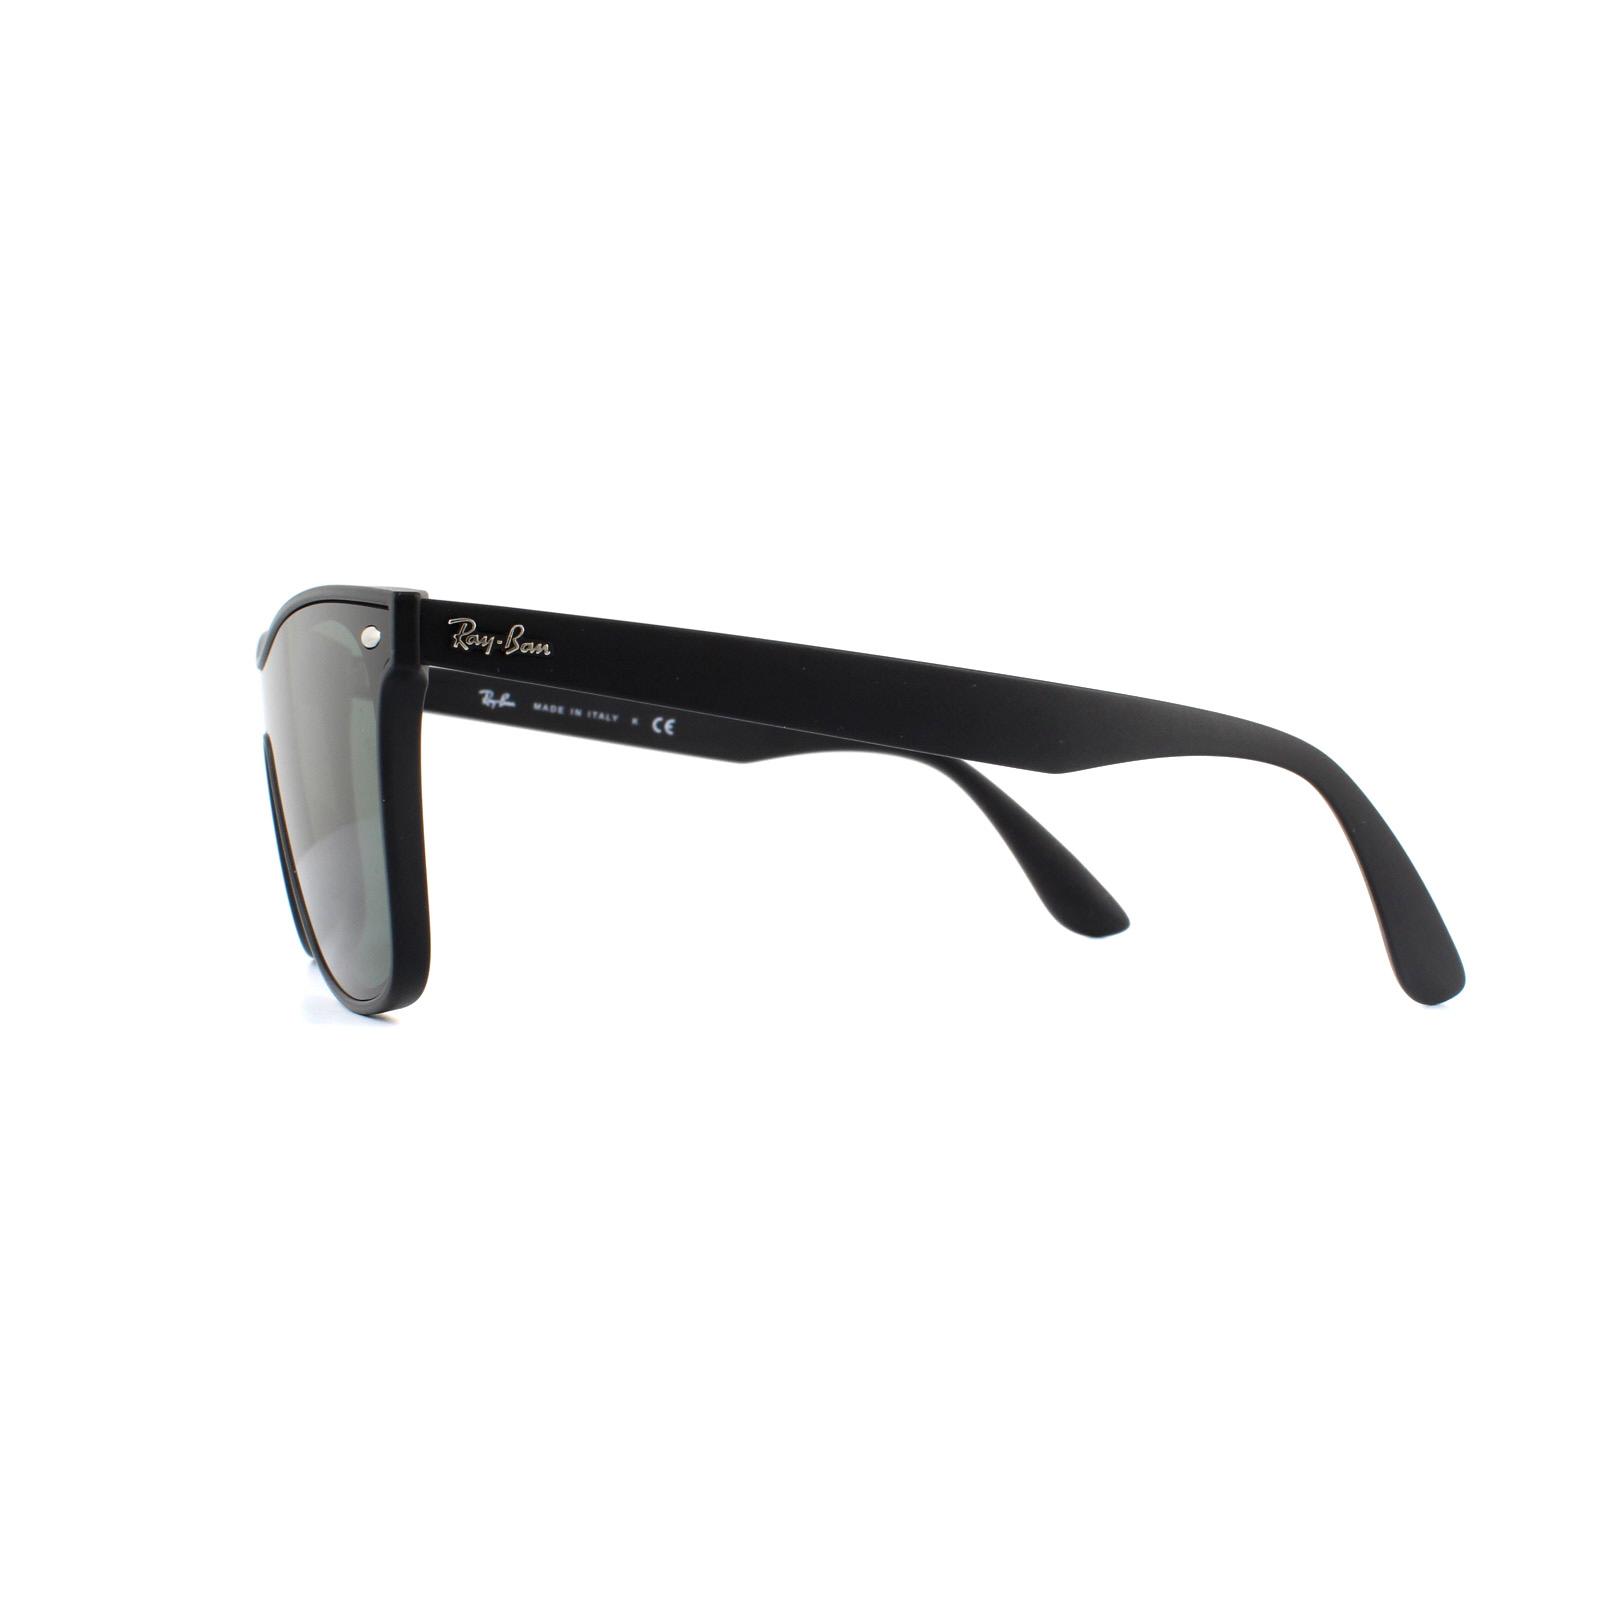 17ac0fc149a Cheap Ray-Ban Blaze Wayfarer 4440N Sunglasses - Discounted Sunglasses